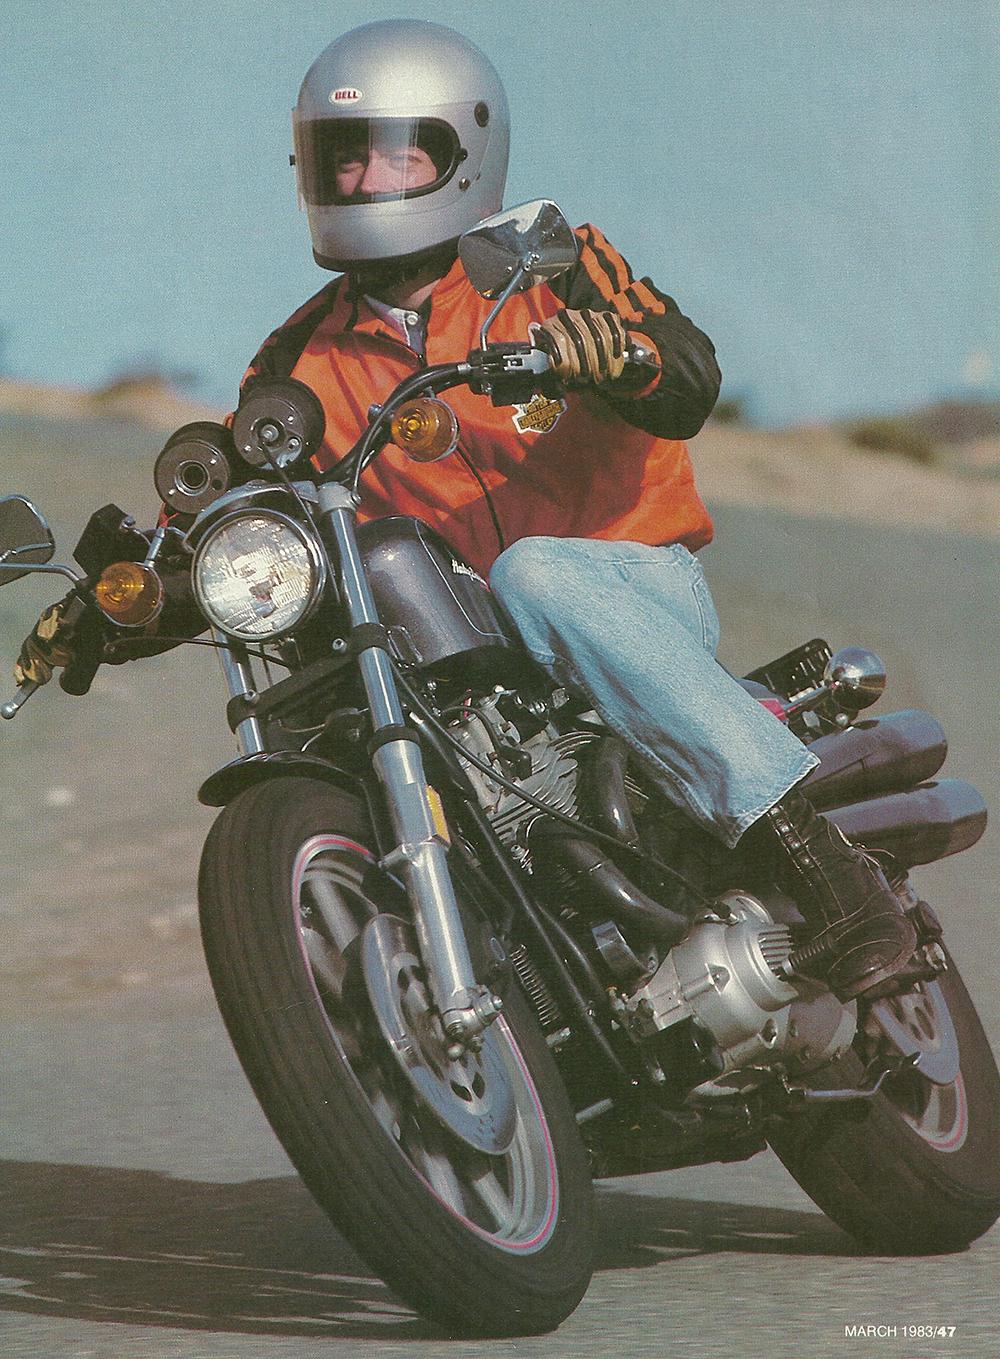 1983 Harley-Davidson XR1000 road test 02.jpg